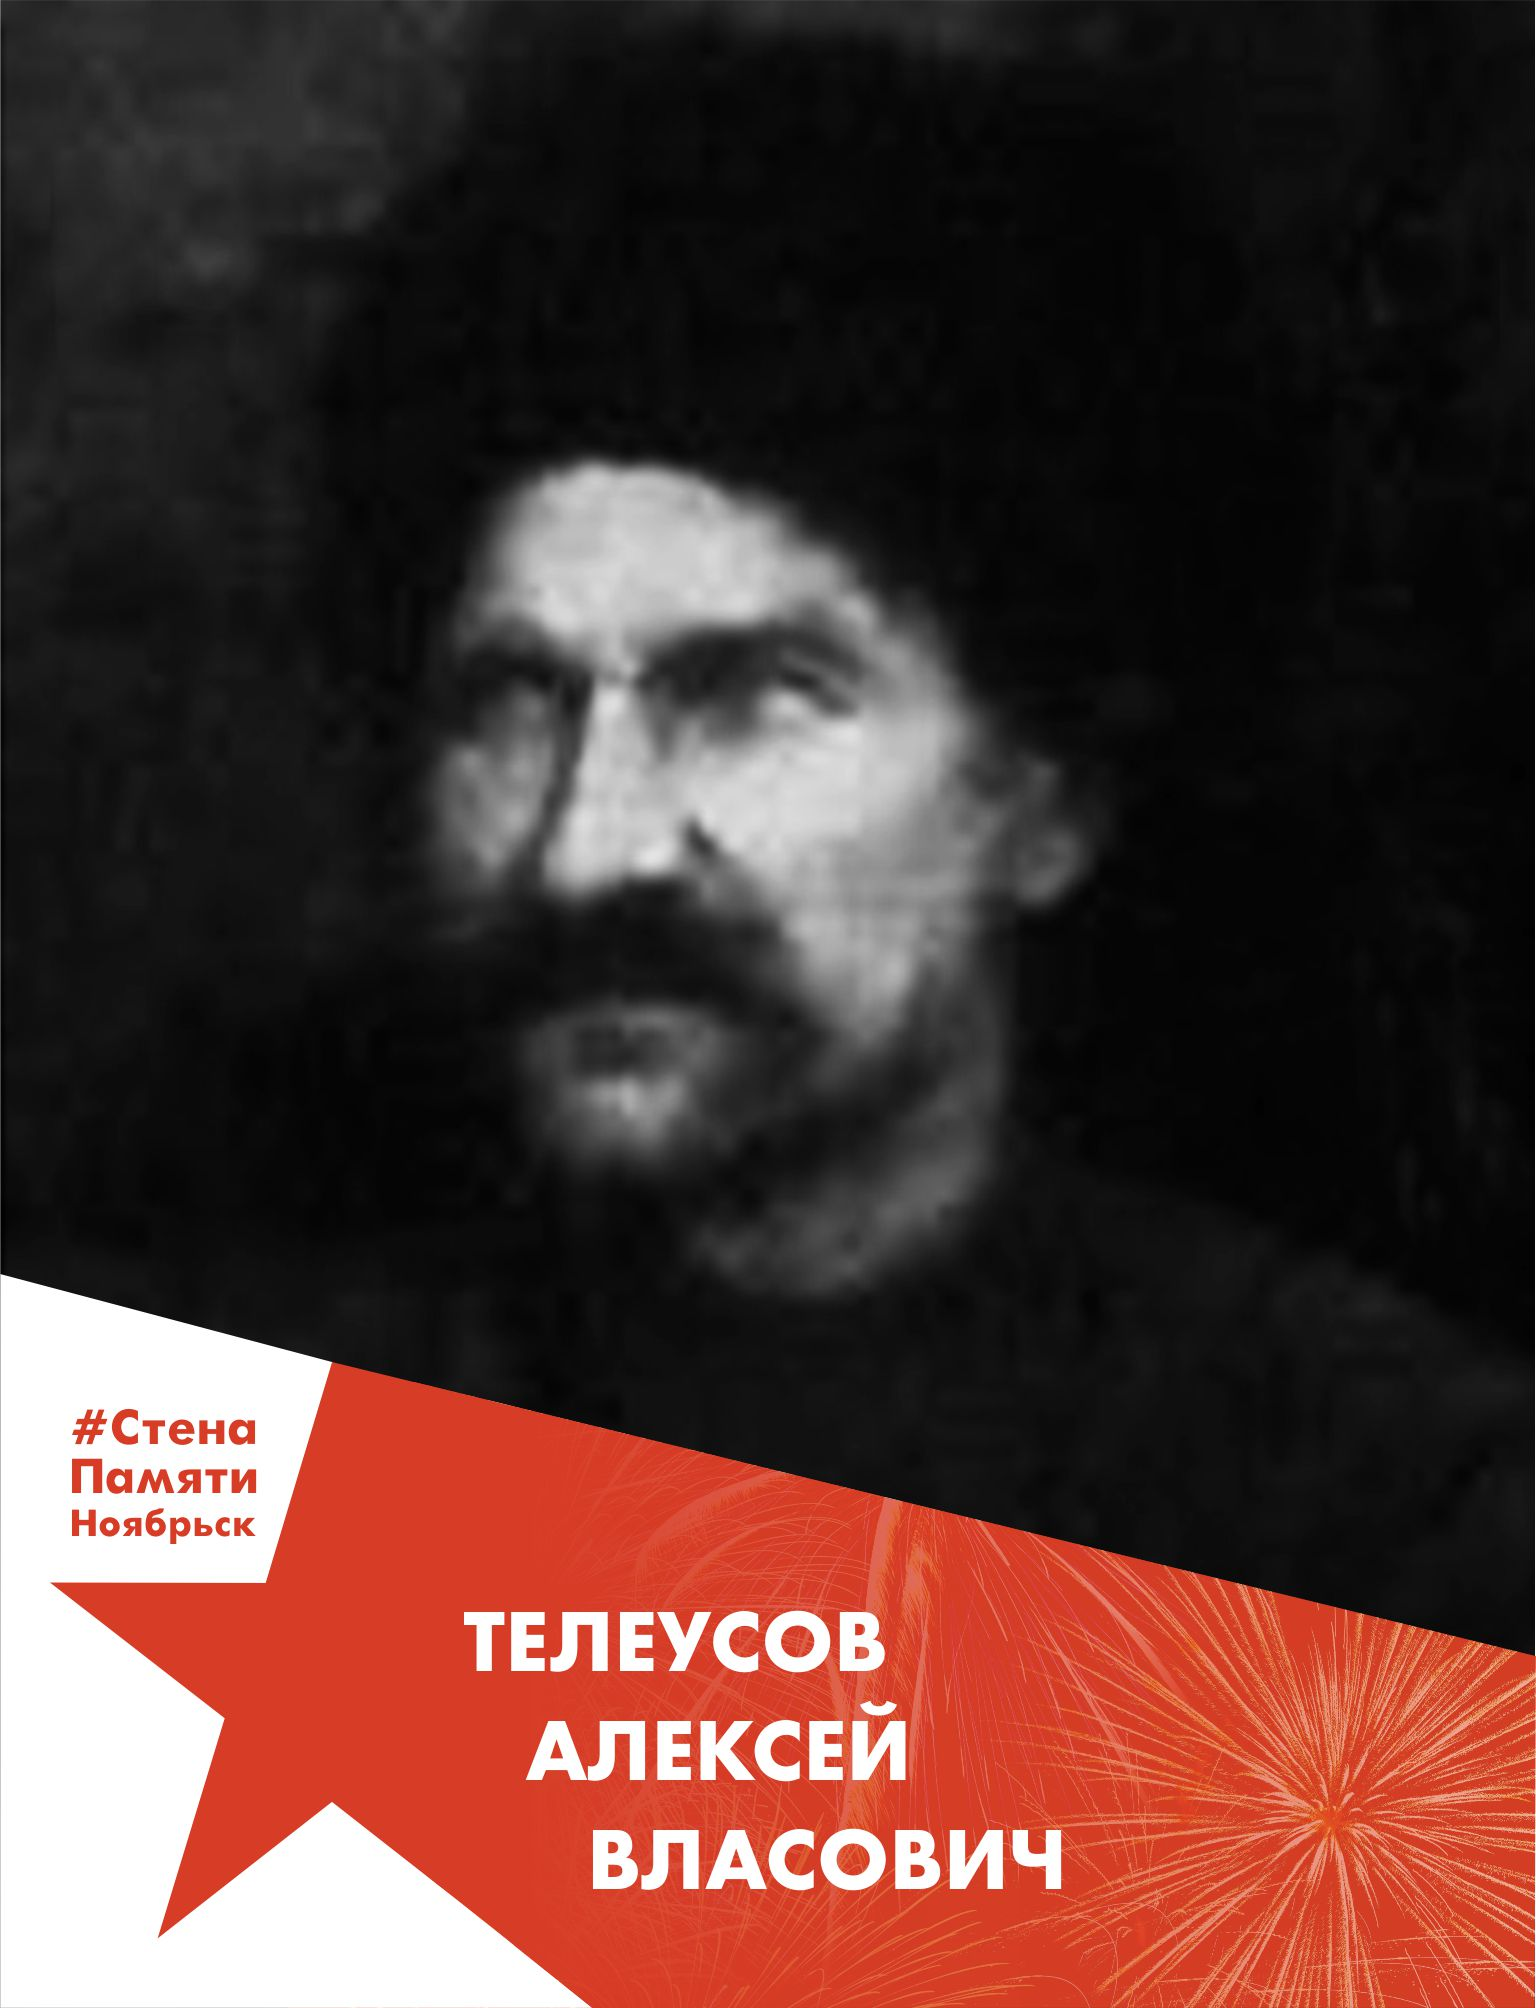 Телеусов Алексей Власович